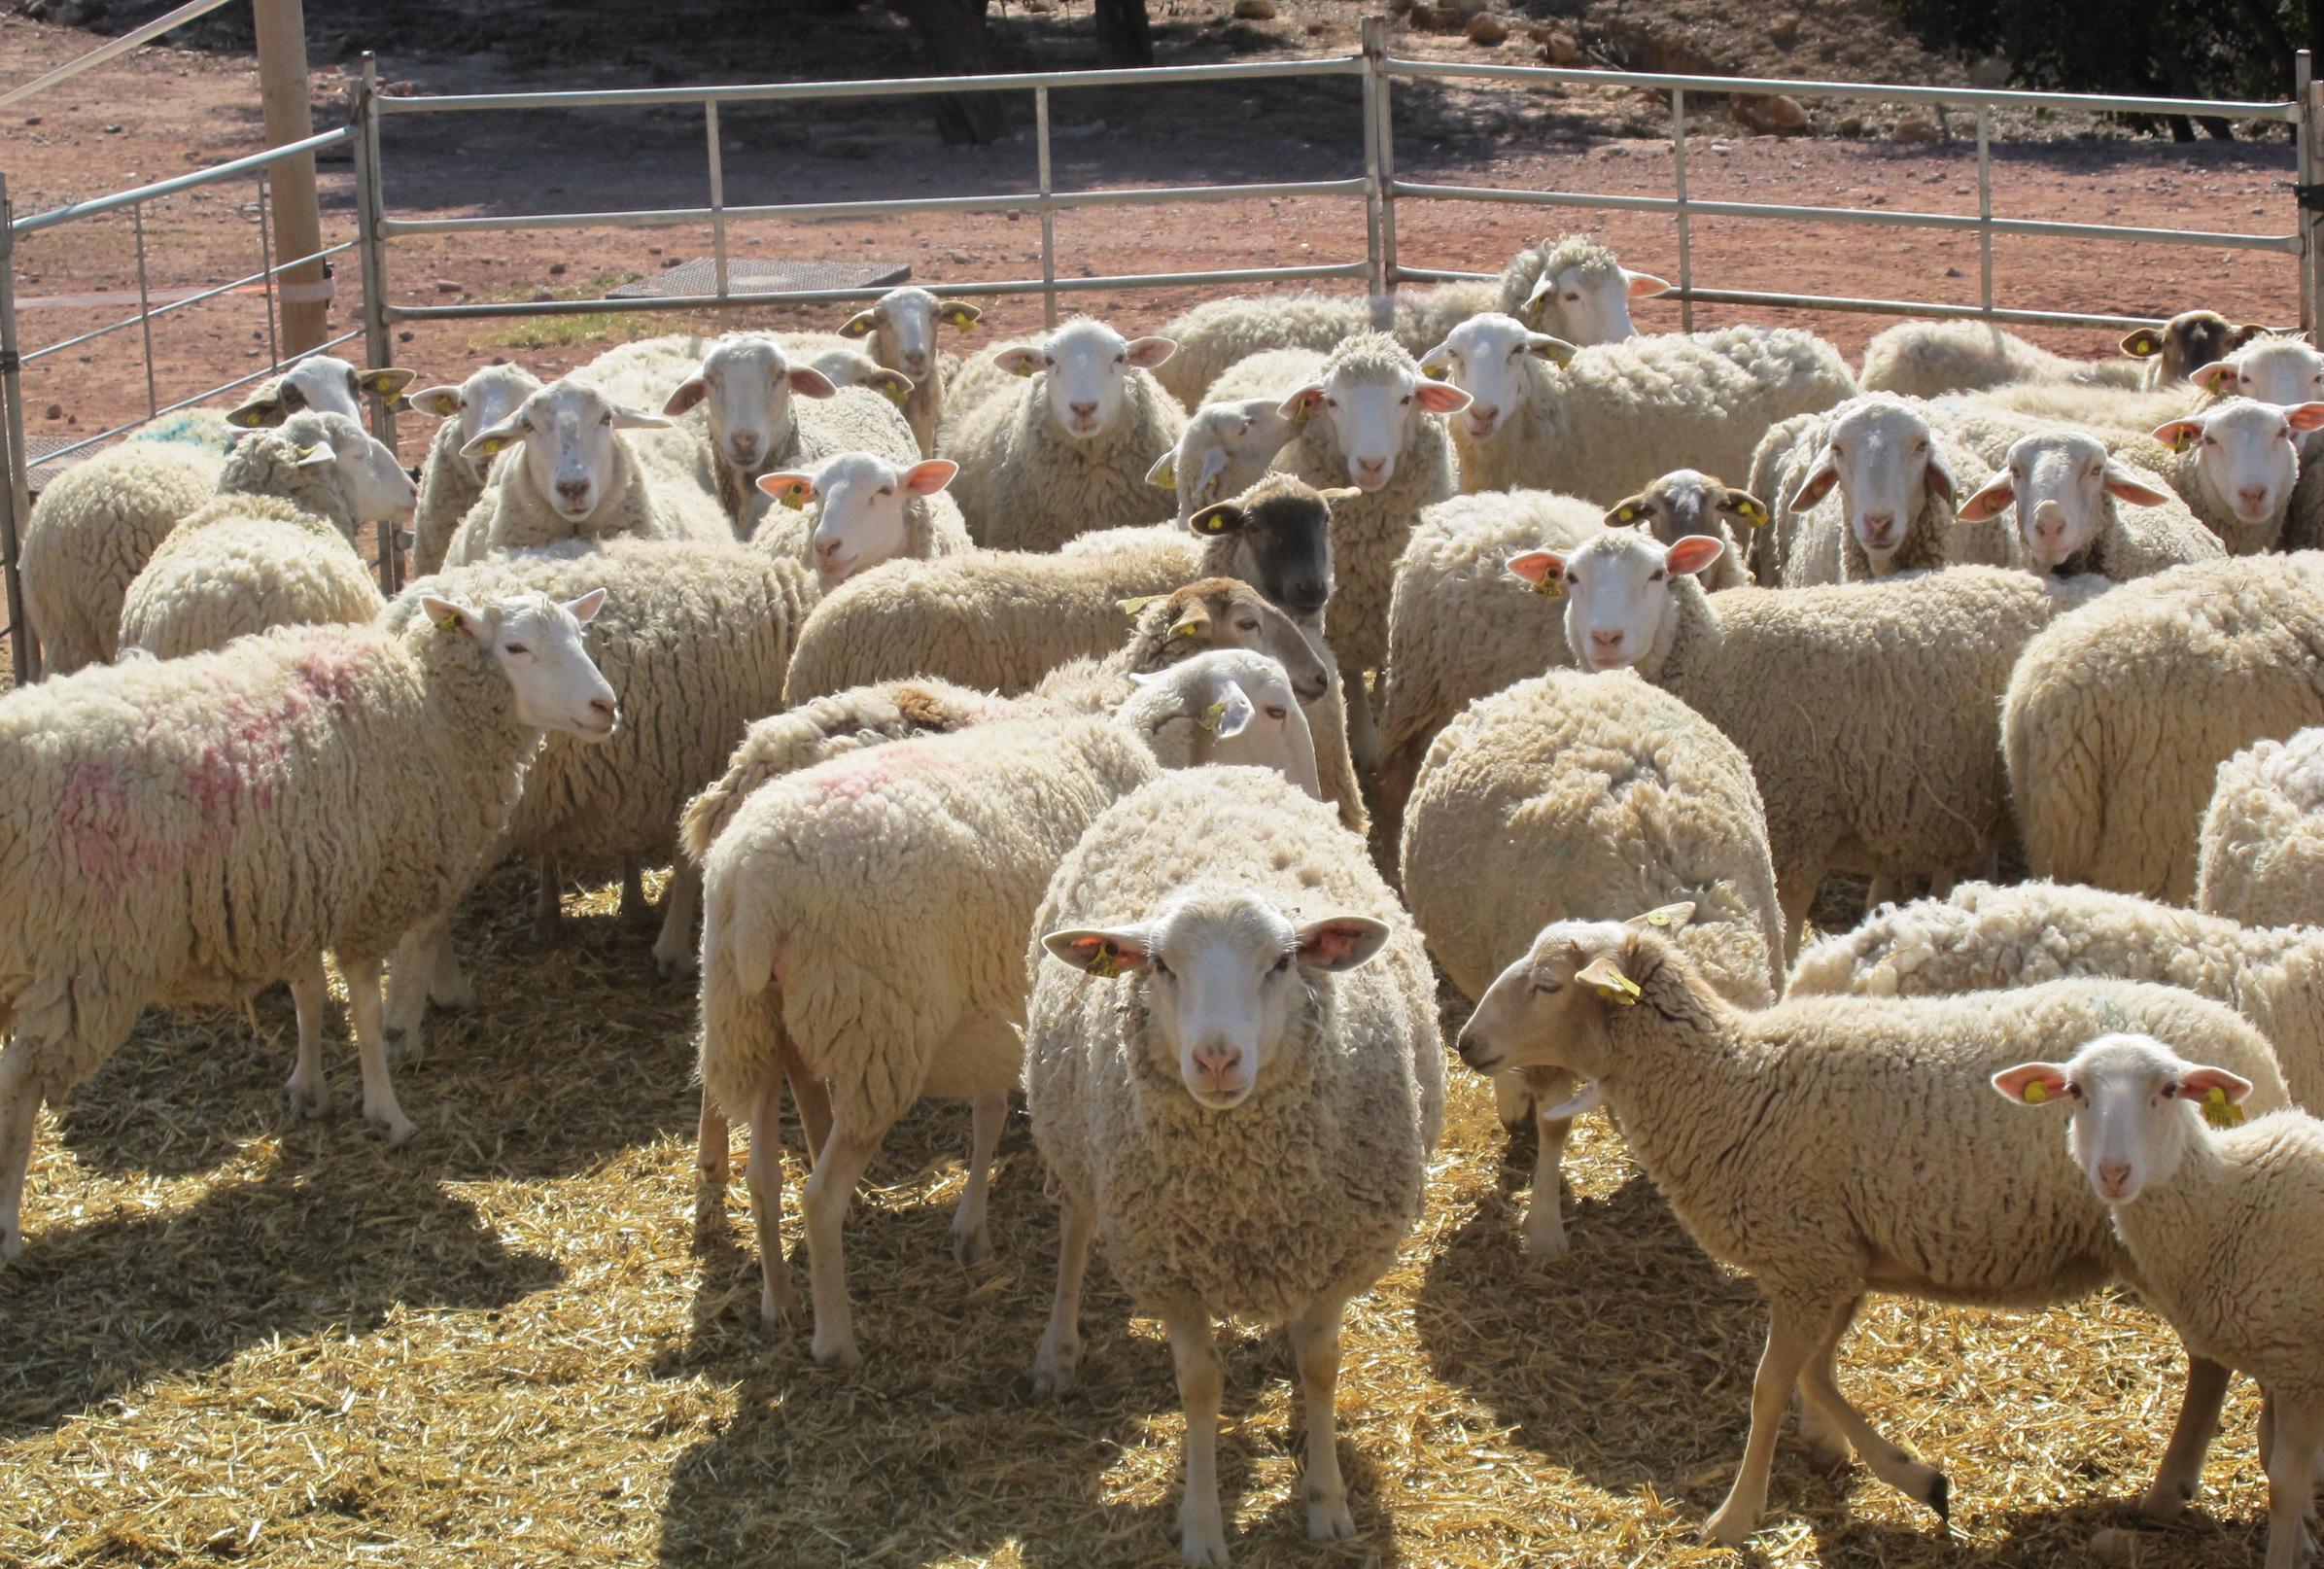 Researchers develop new reproductive protocol for ovine